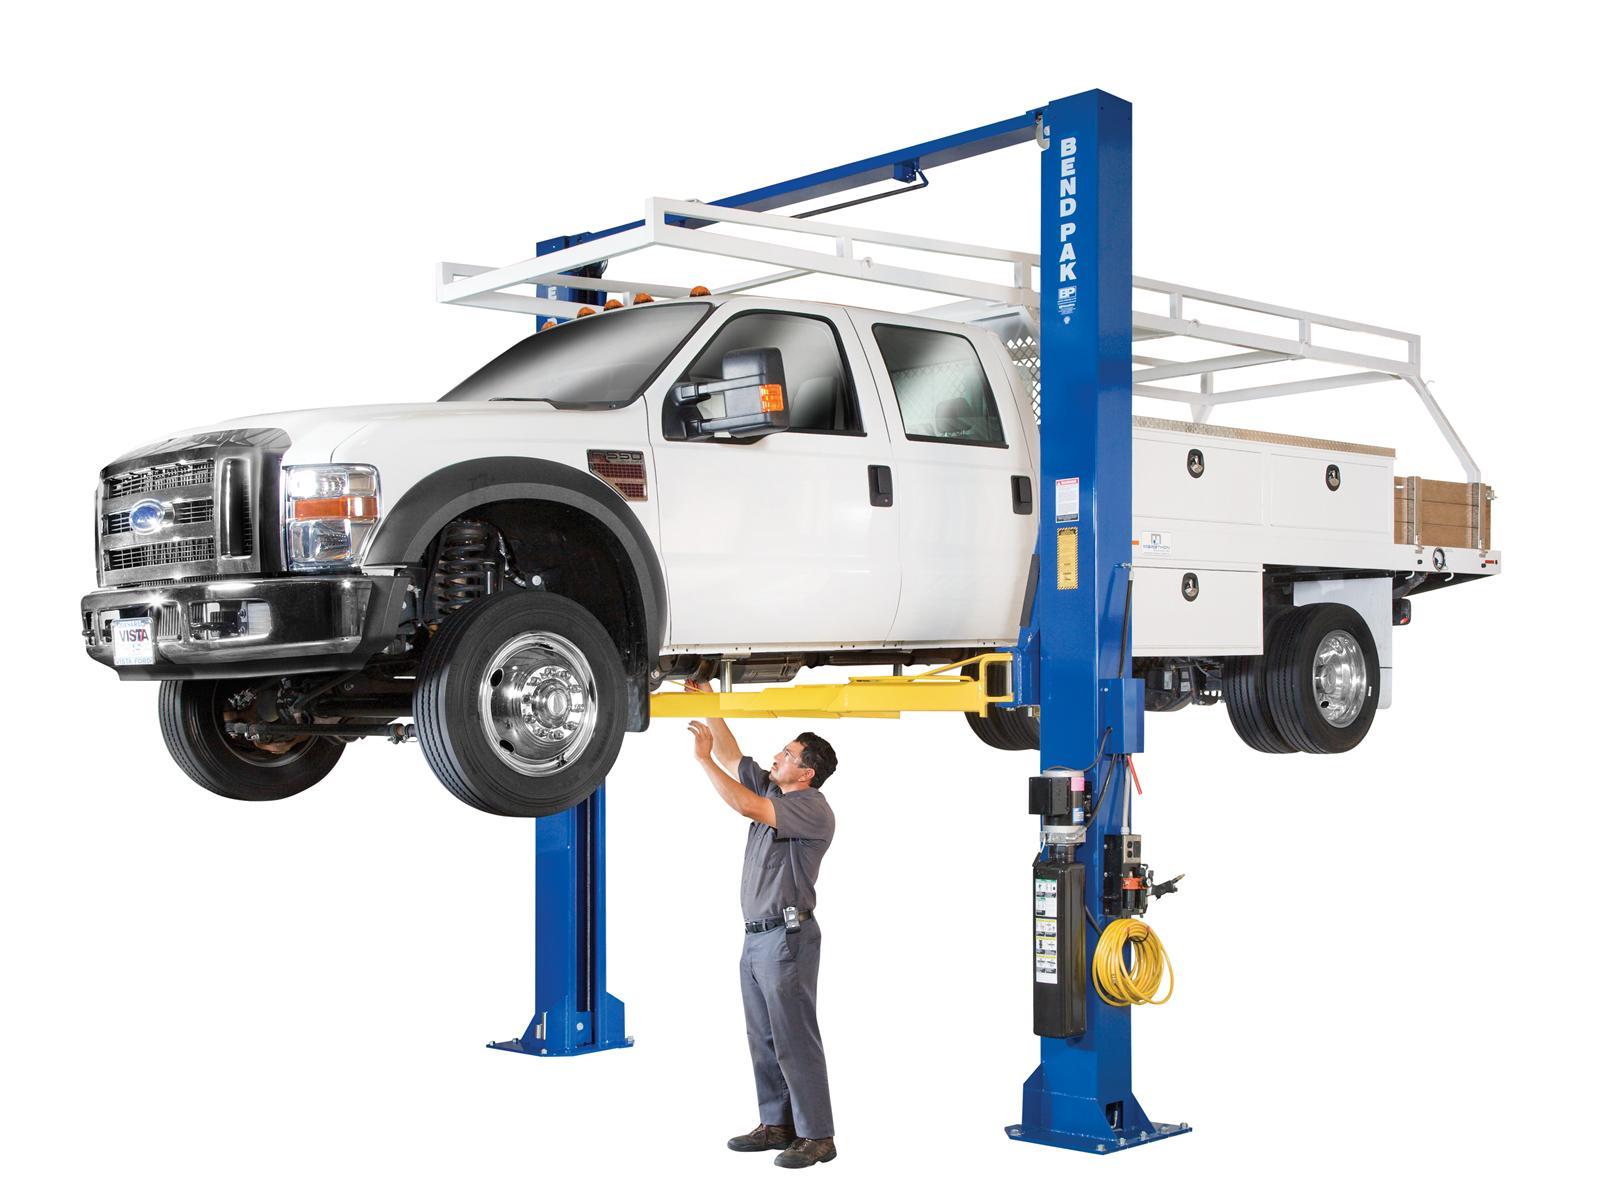 Automotive Lift Accessories : Bendpak xpr c clear floor standard arm post lifts